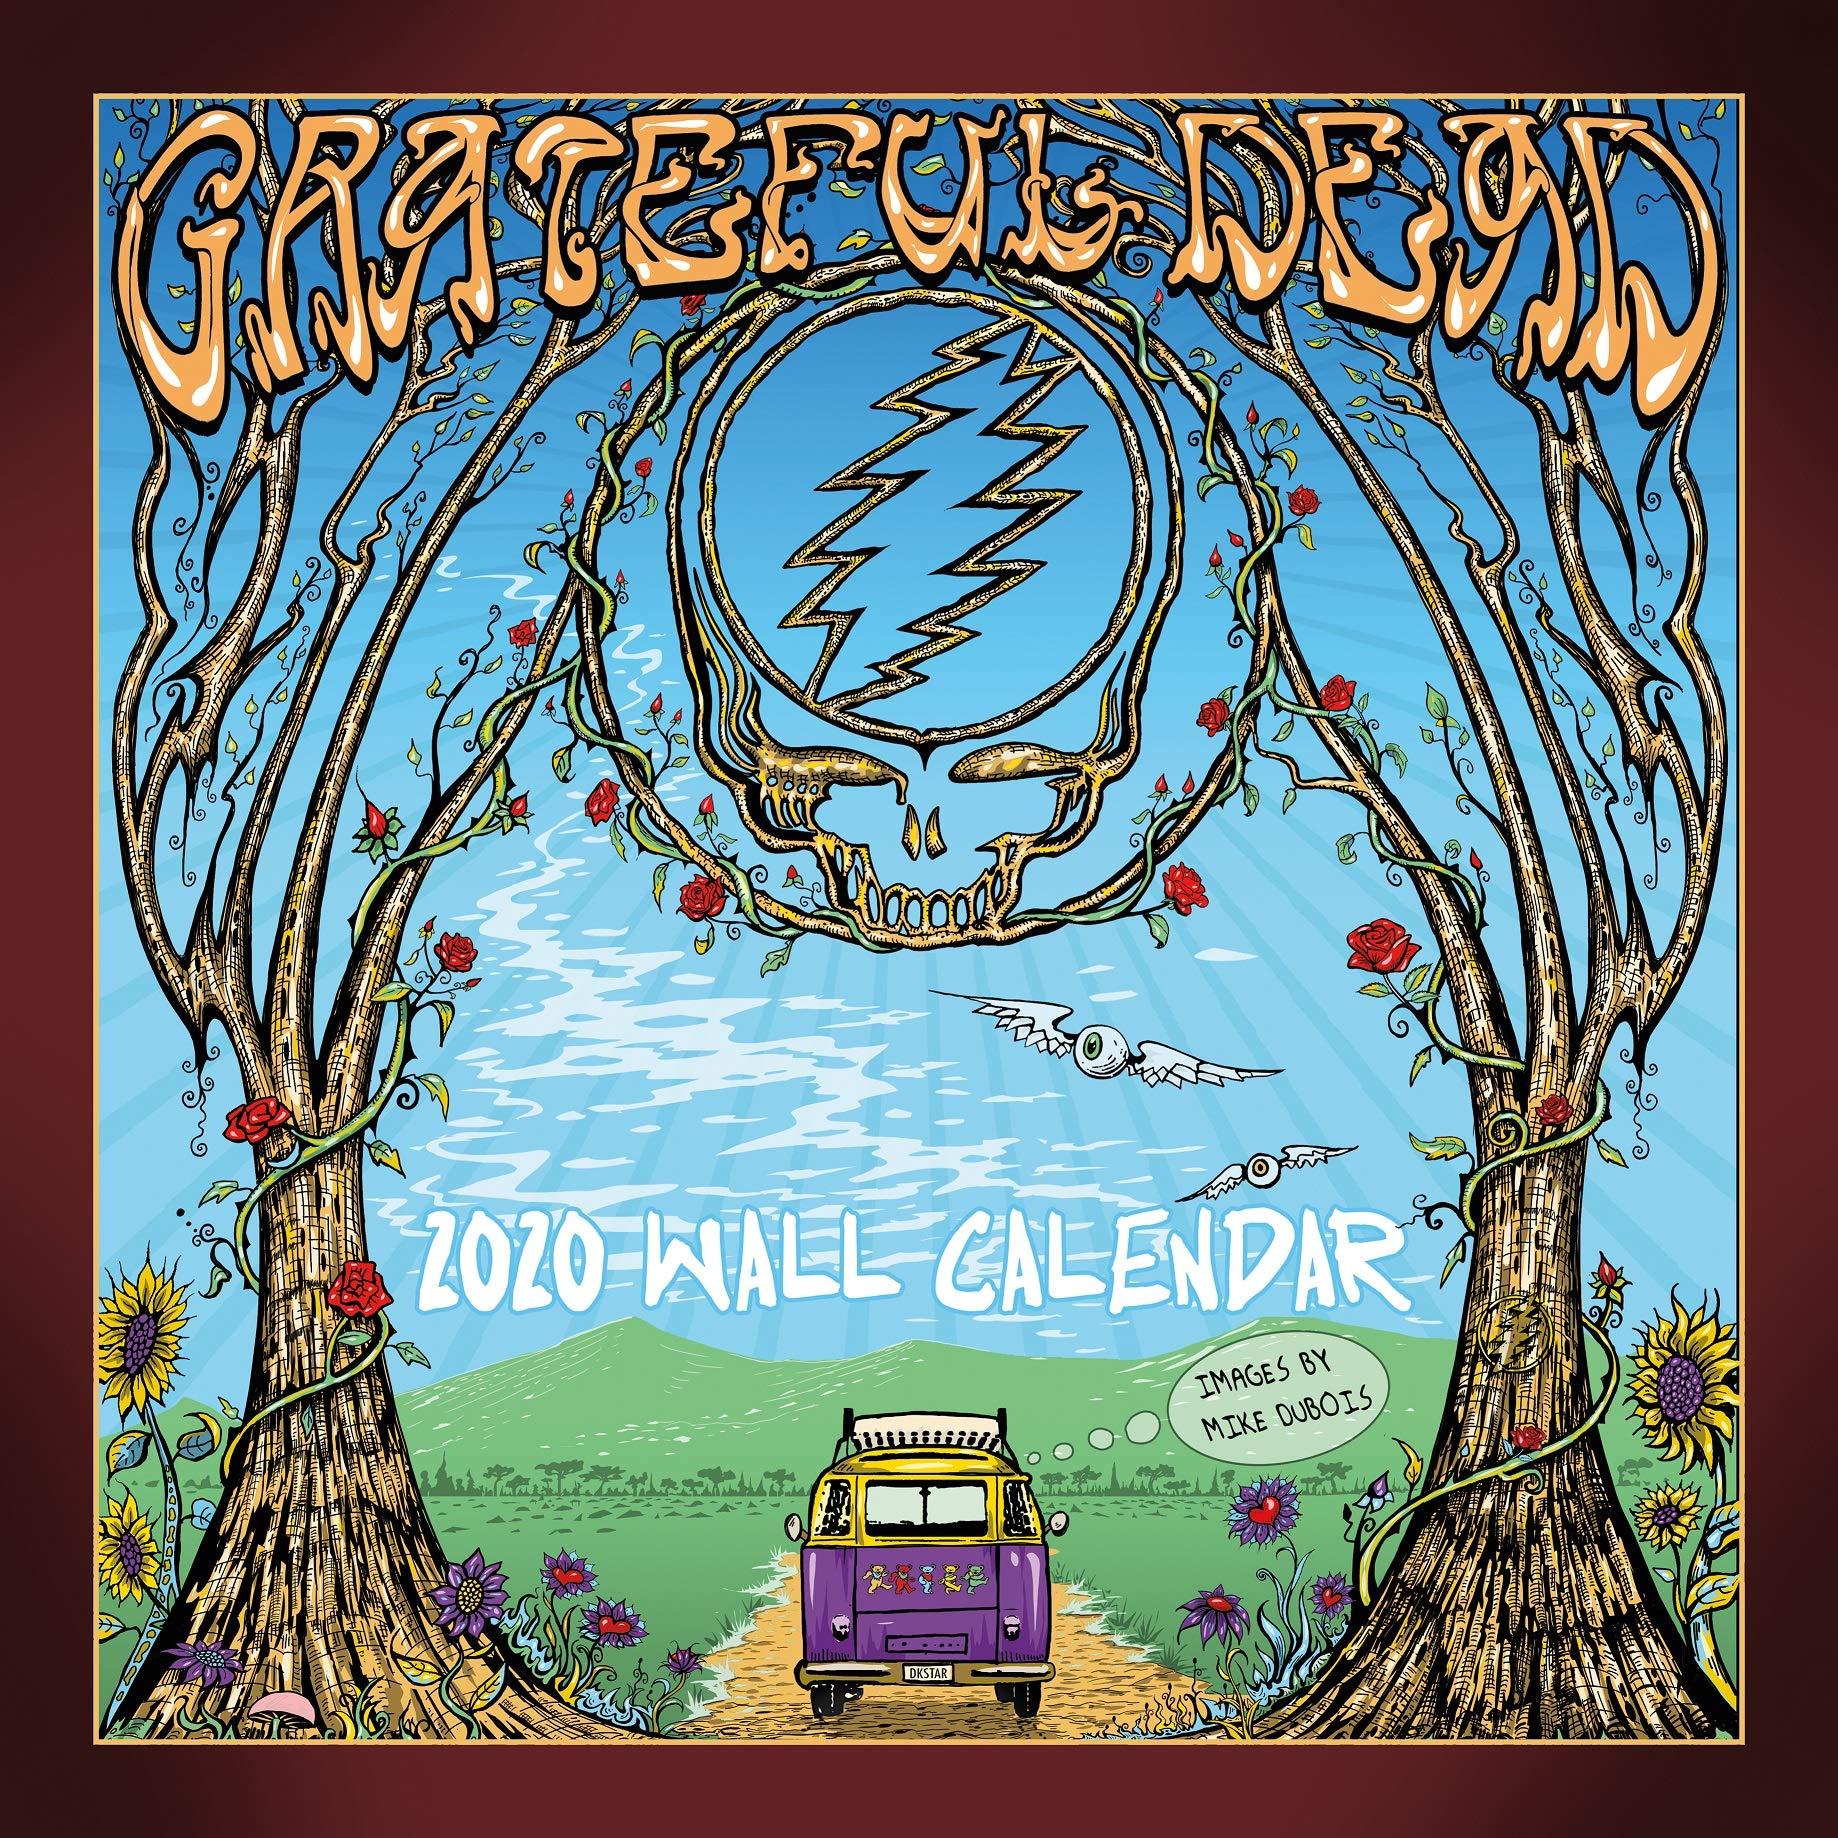 Grateful Dead 2020 Calendar